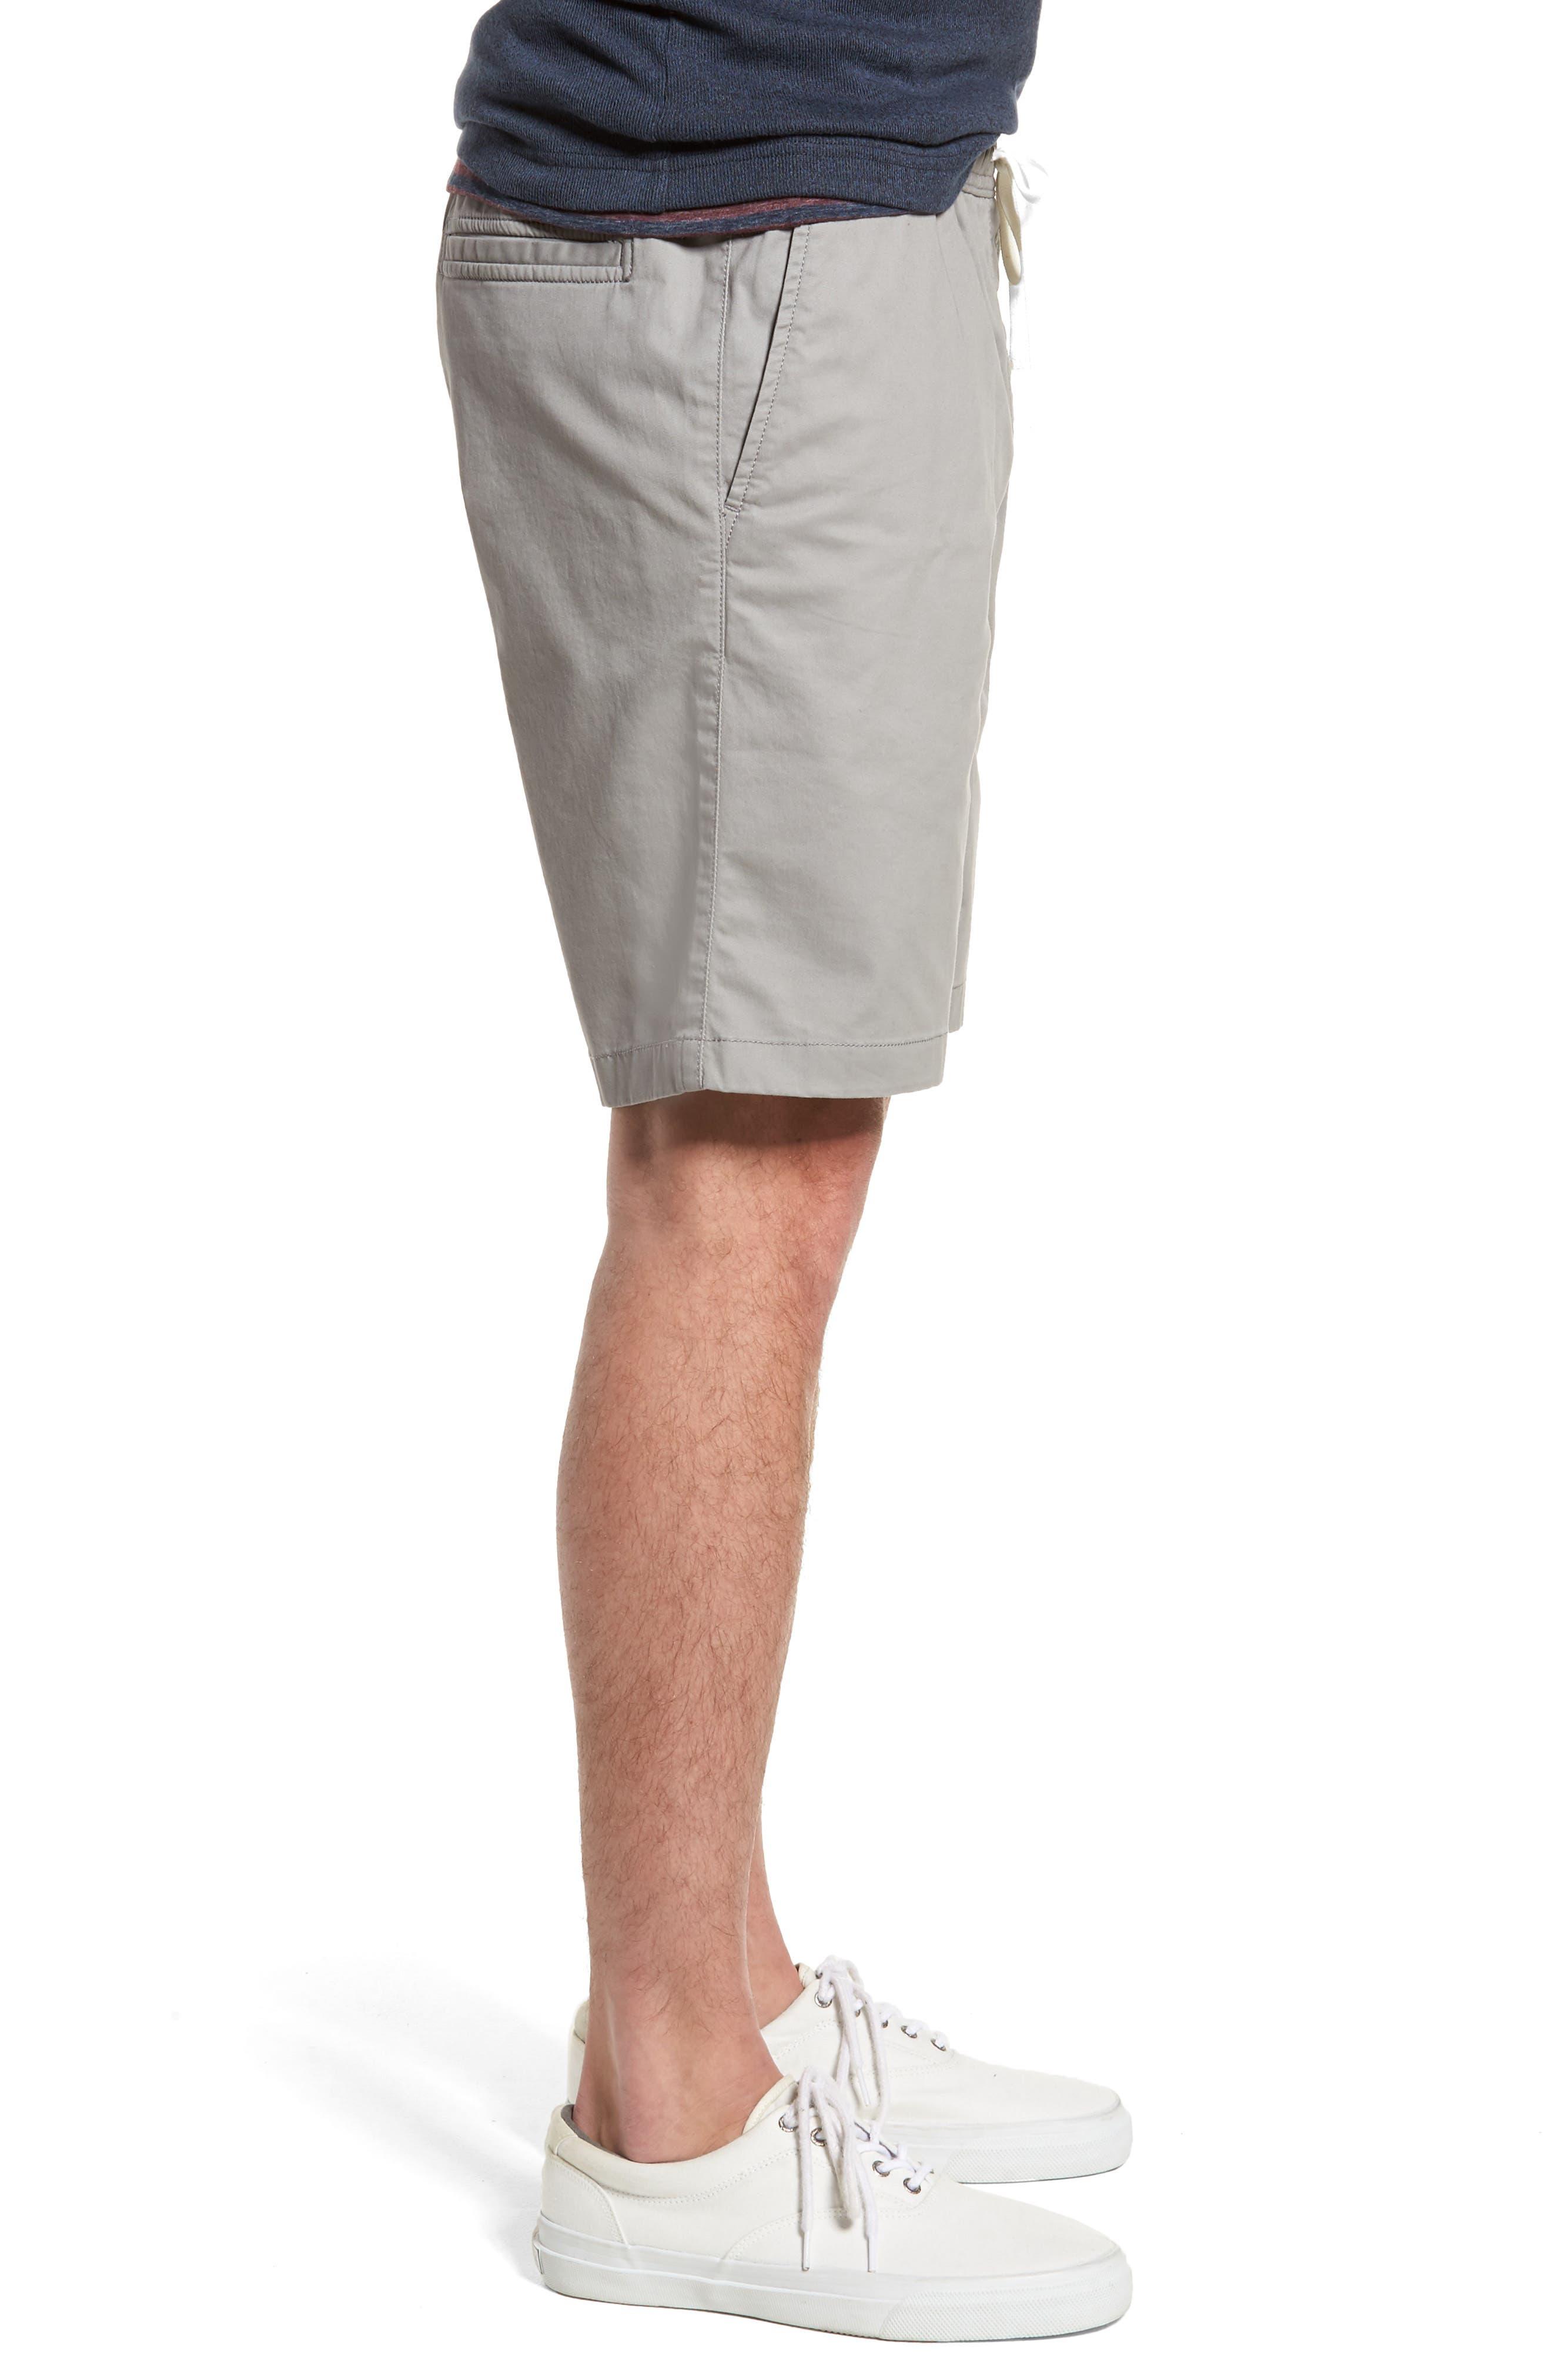 Ballard Slim Fit Shorts,                             Alternate thumbnail 3, color,                             030